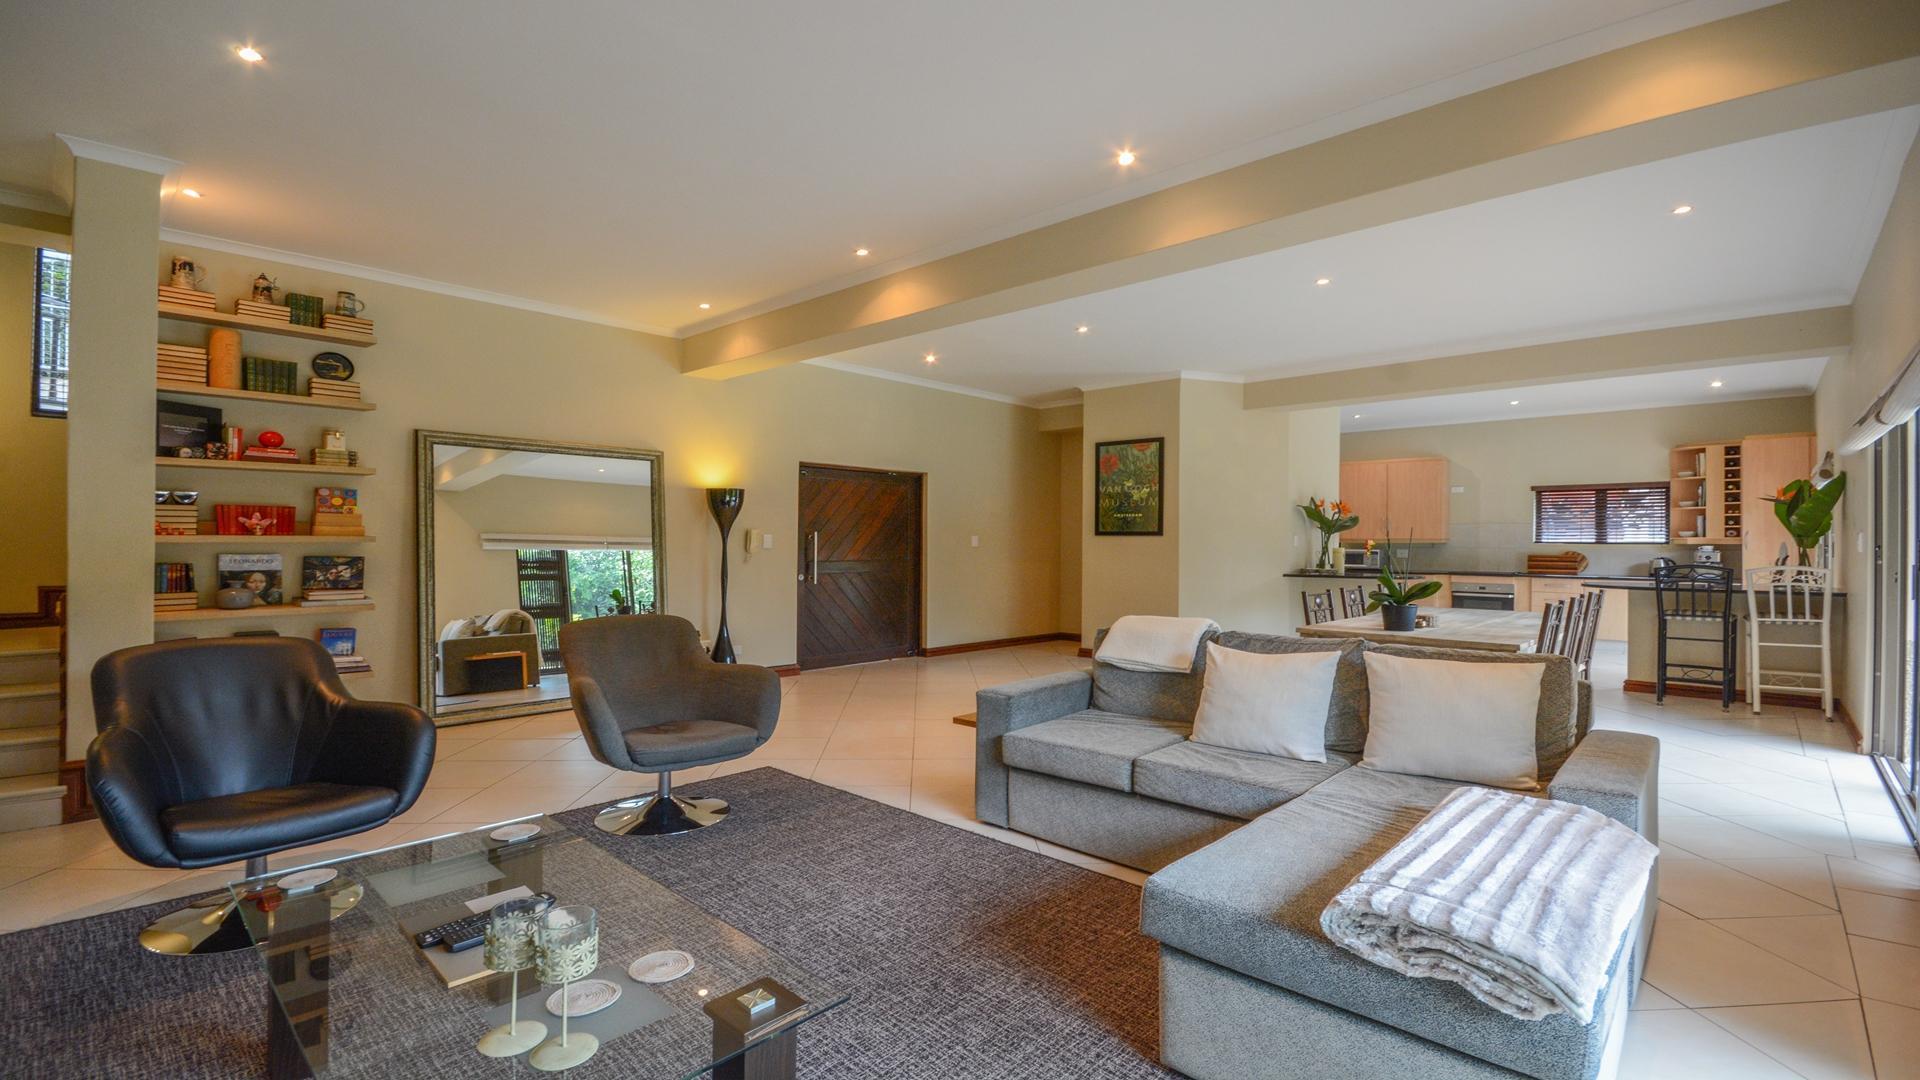 3 BedroomHouse For Sale In Salt Rock